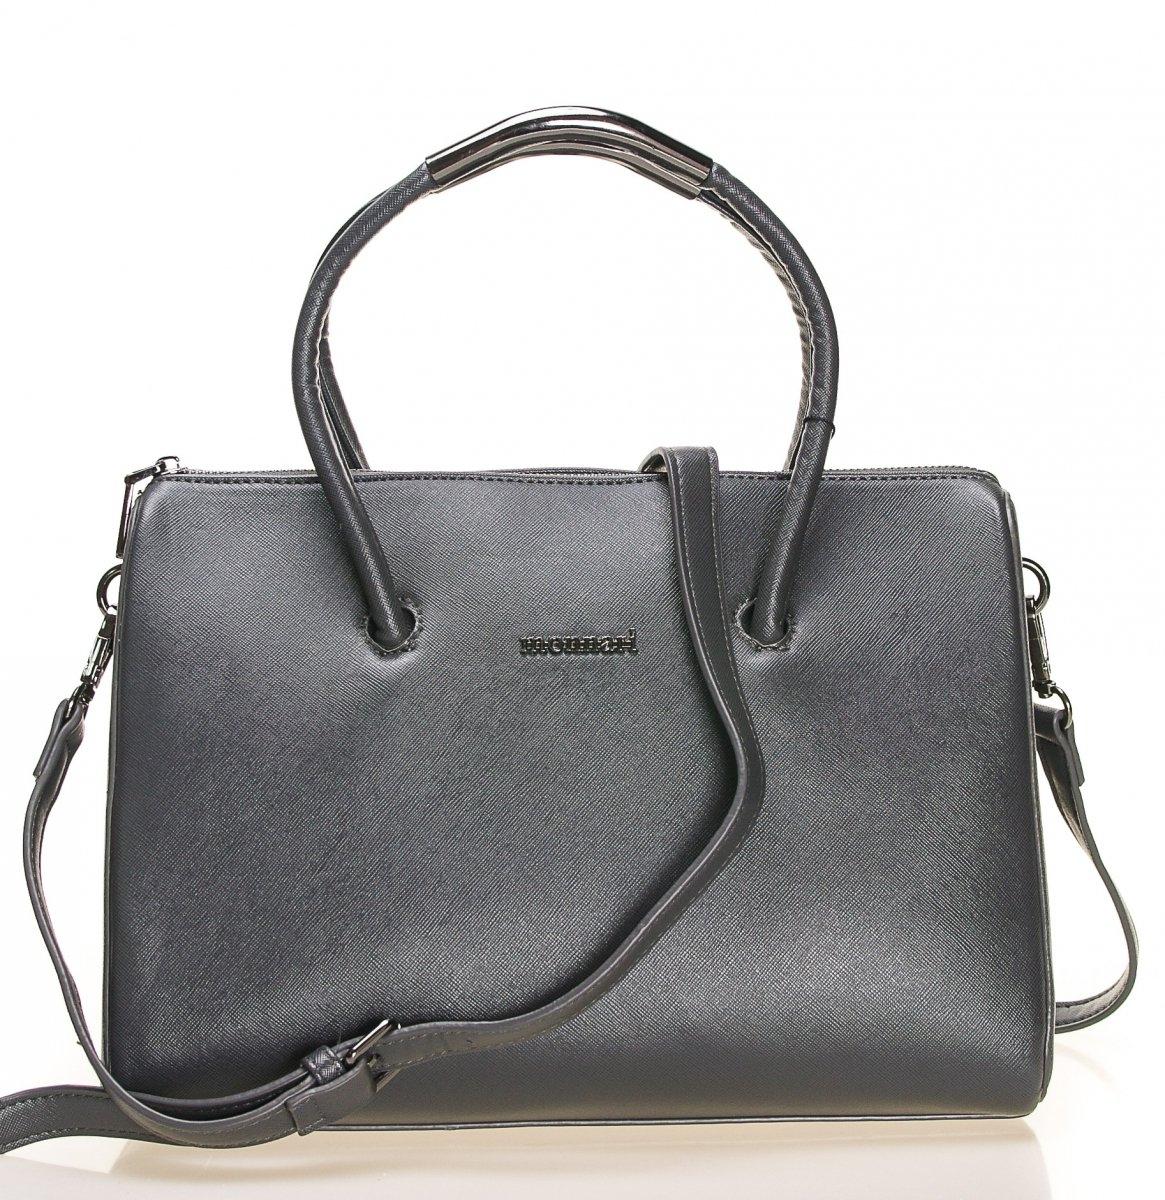 Dámská kabelka Monnari A490, grafitová